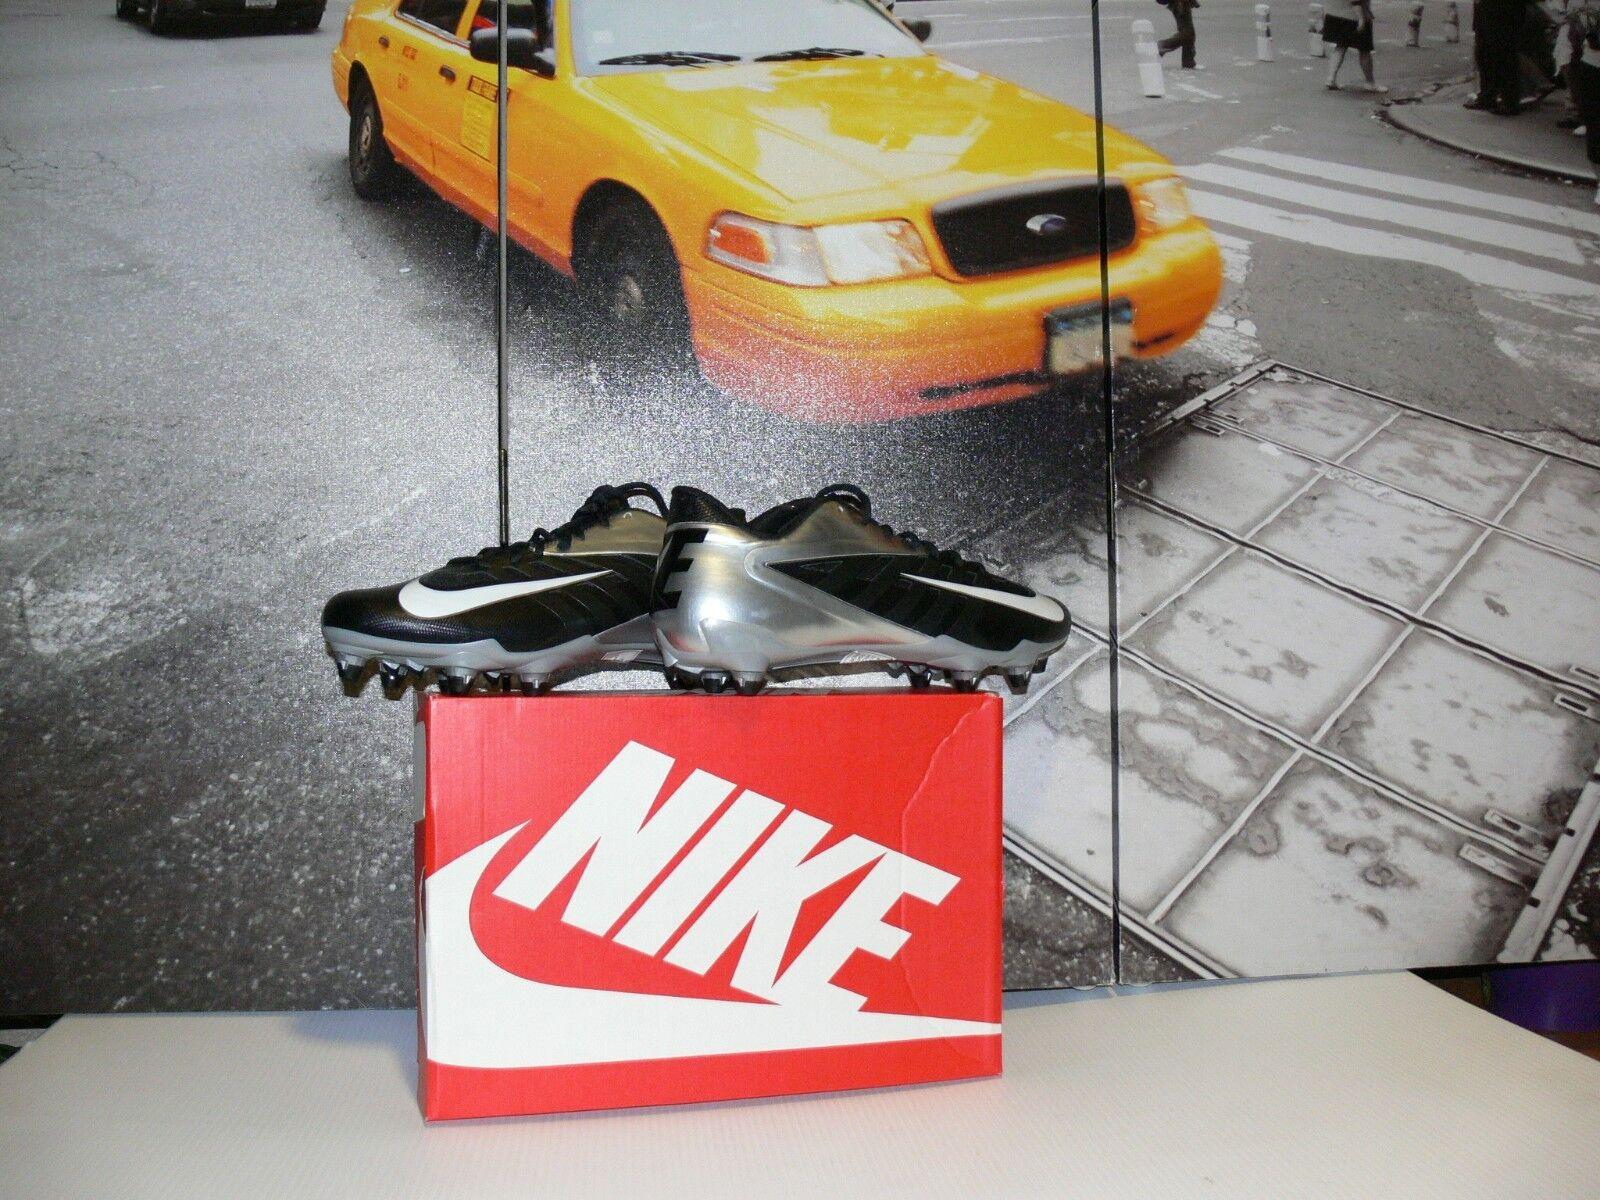 Nike Vapor Pro Low D Football Cleats Black Metallic Silver detachable US 11.5